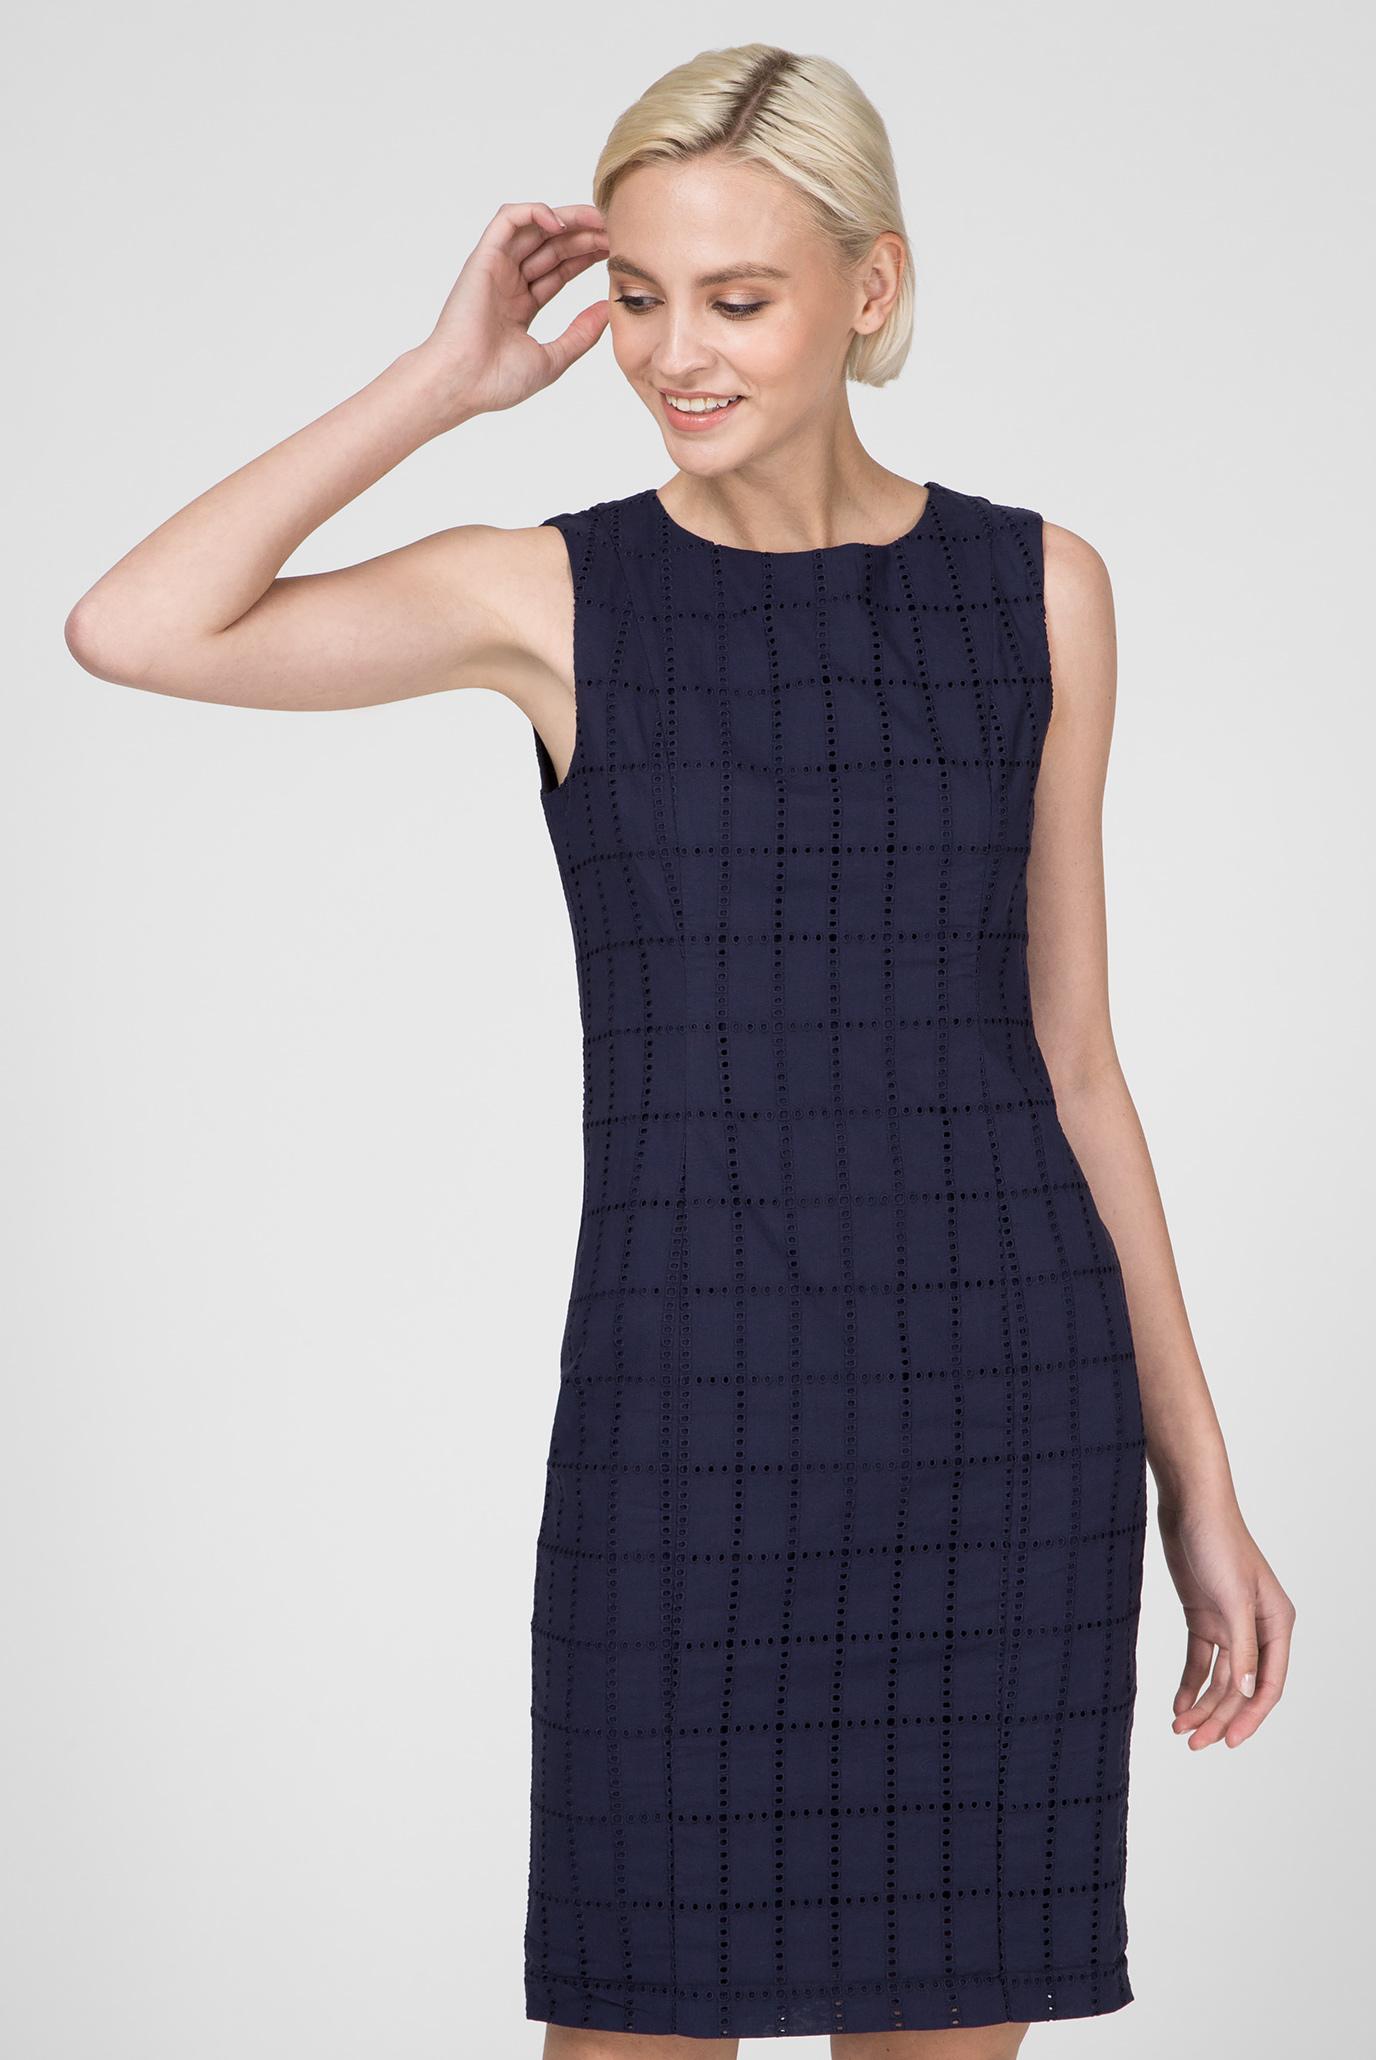 06c8a2d8a0e4 Купить Женское темно-синее платье BRODERIE ANGLAISE Gant Gant ...